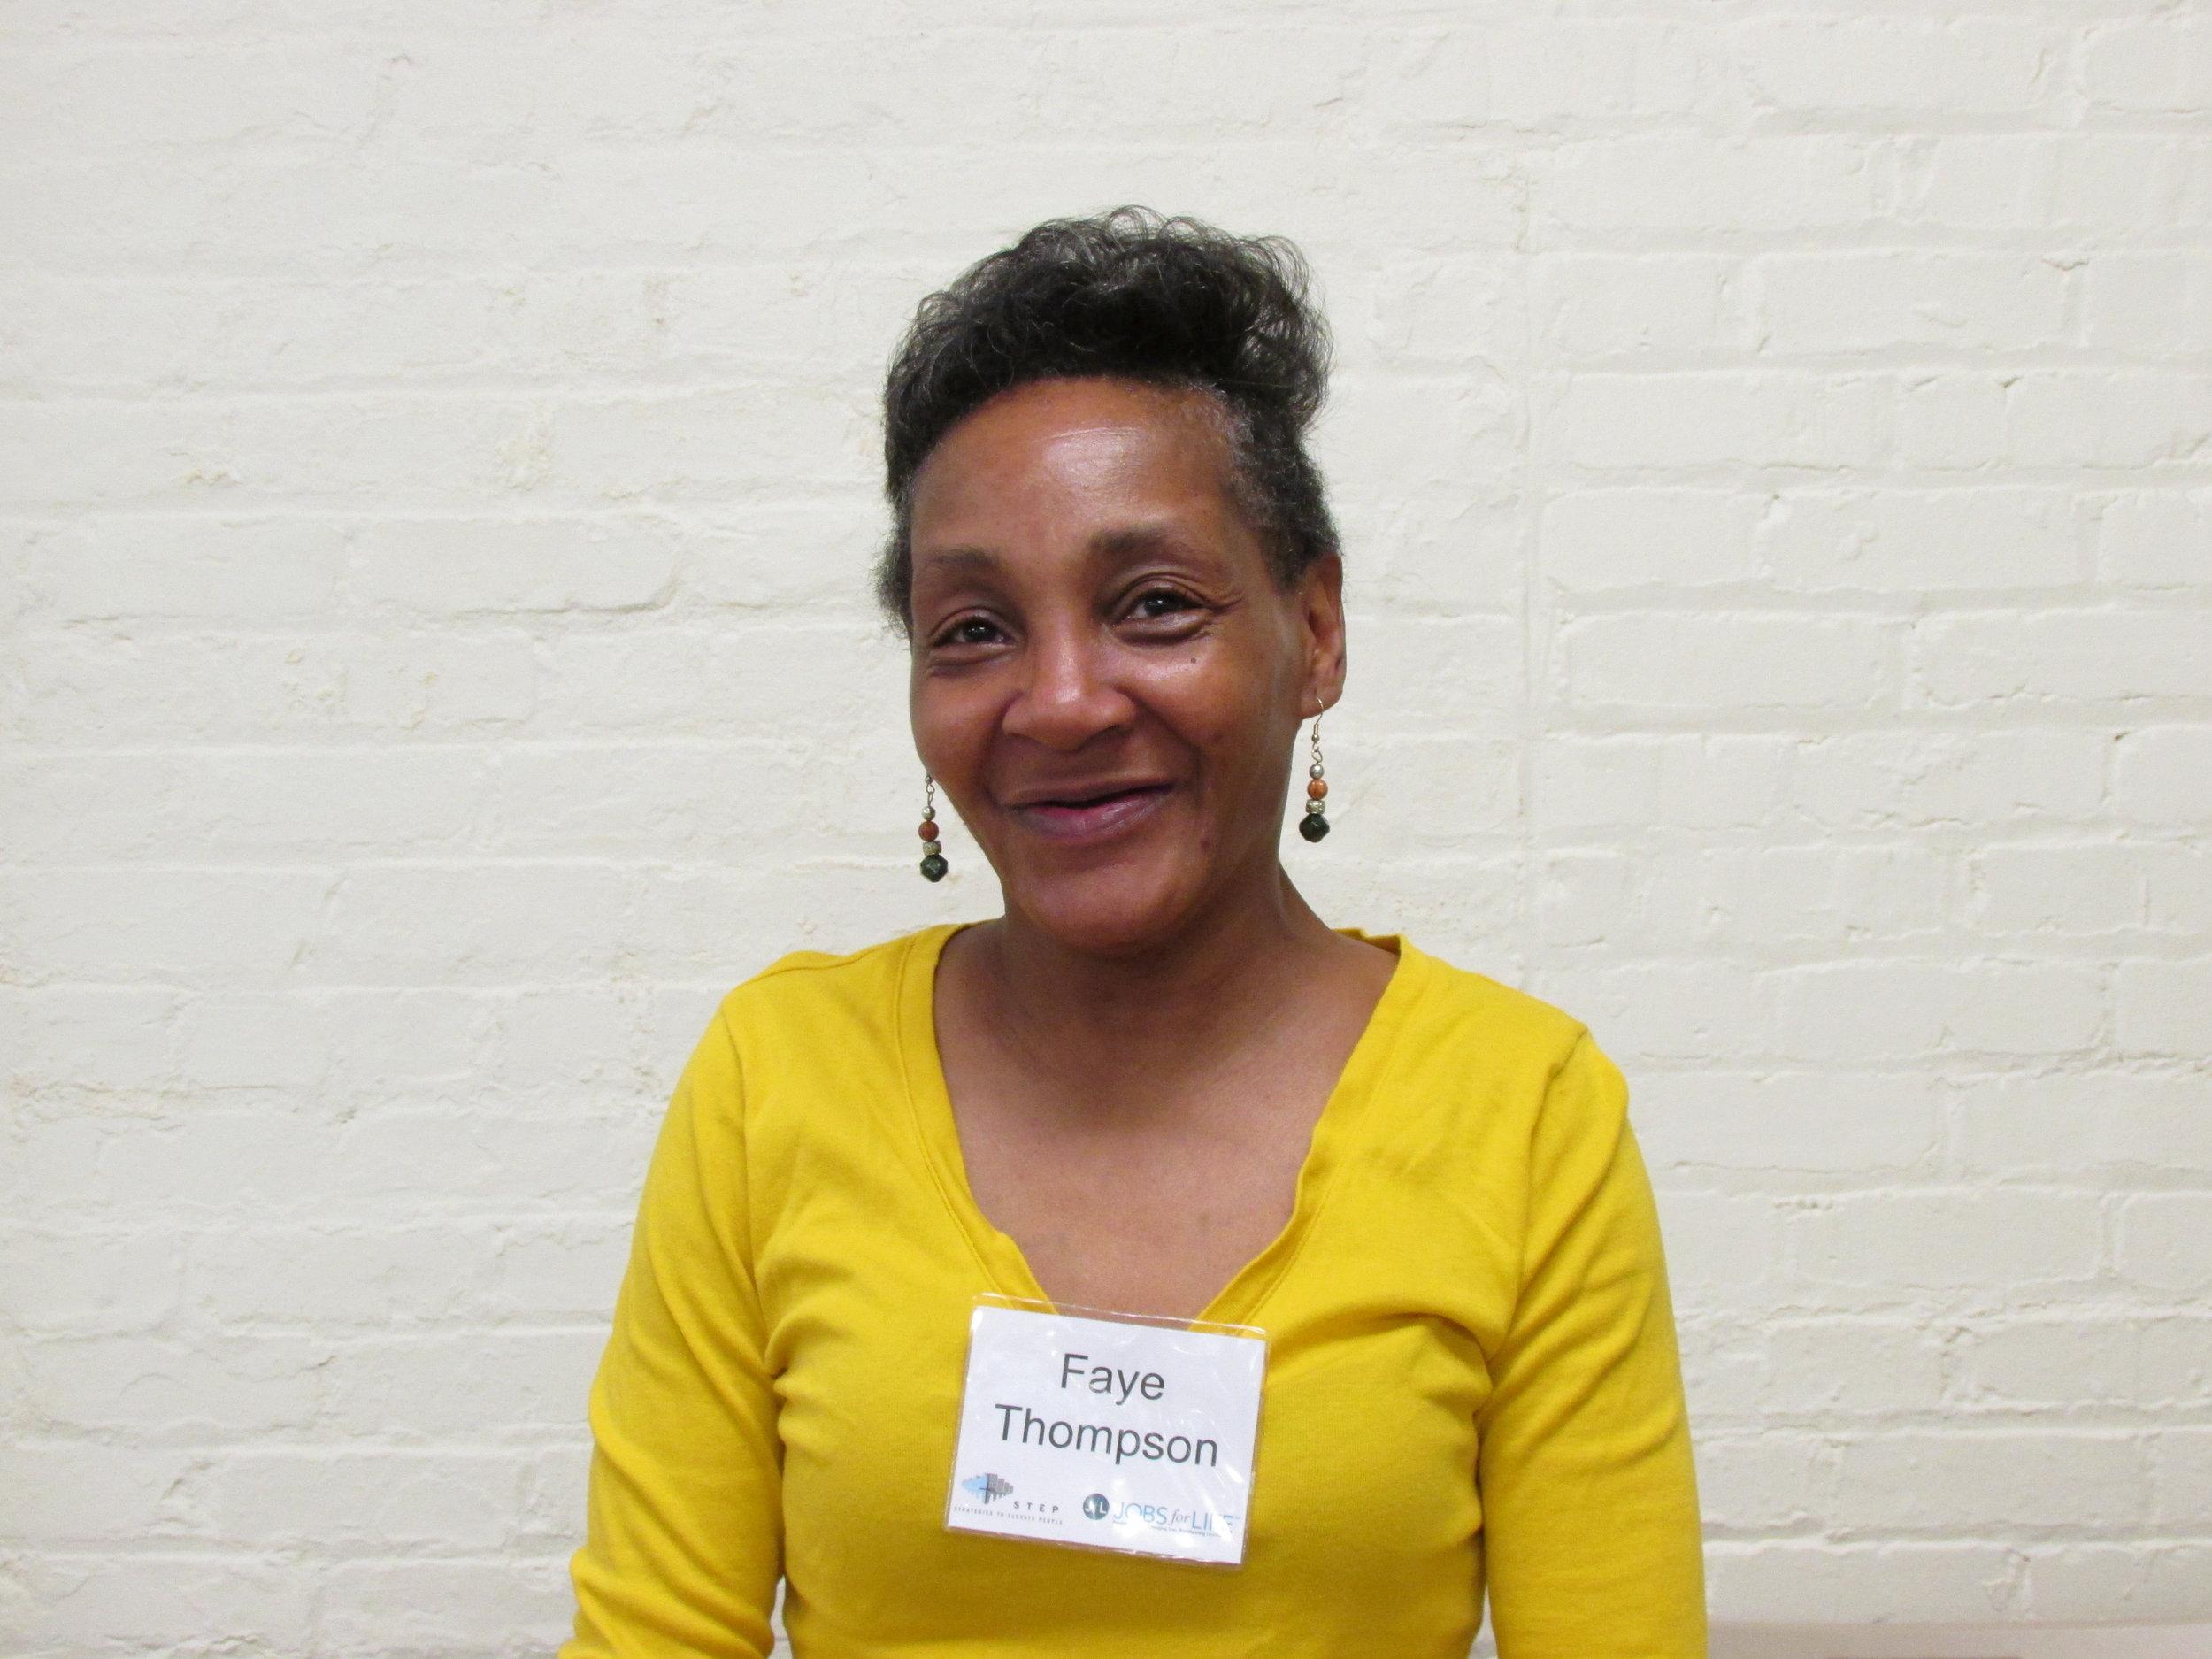 Faye Thompson (2) (2017_05_12 14_05_46 UTC).JPG